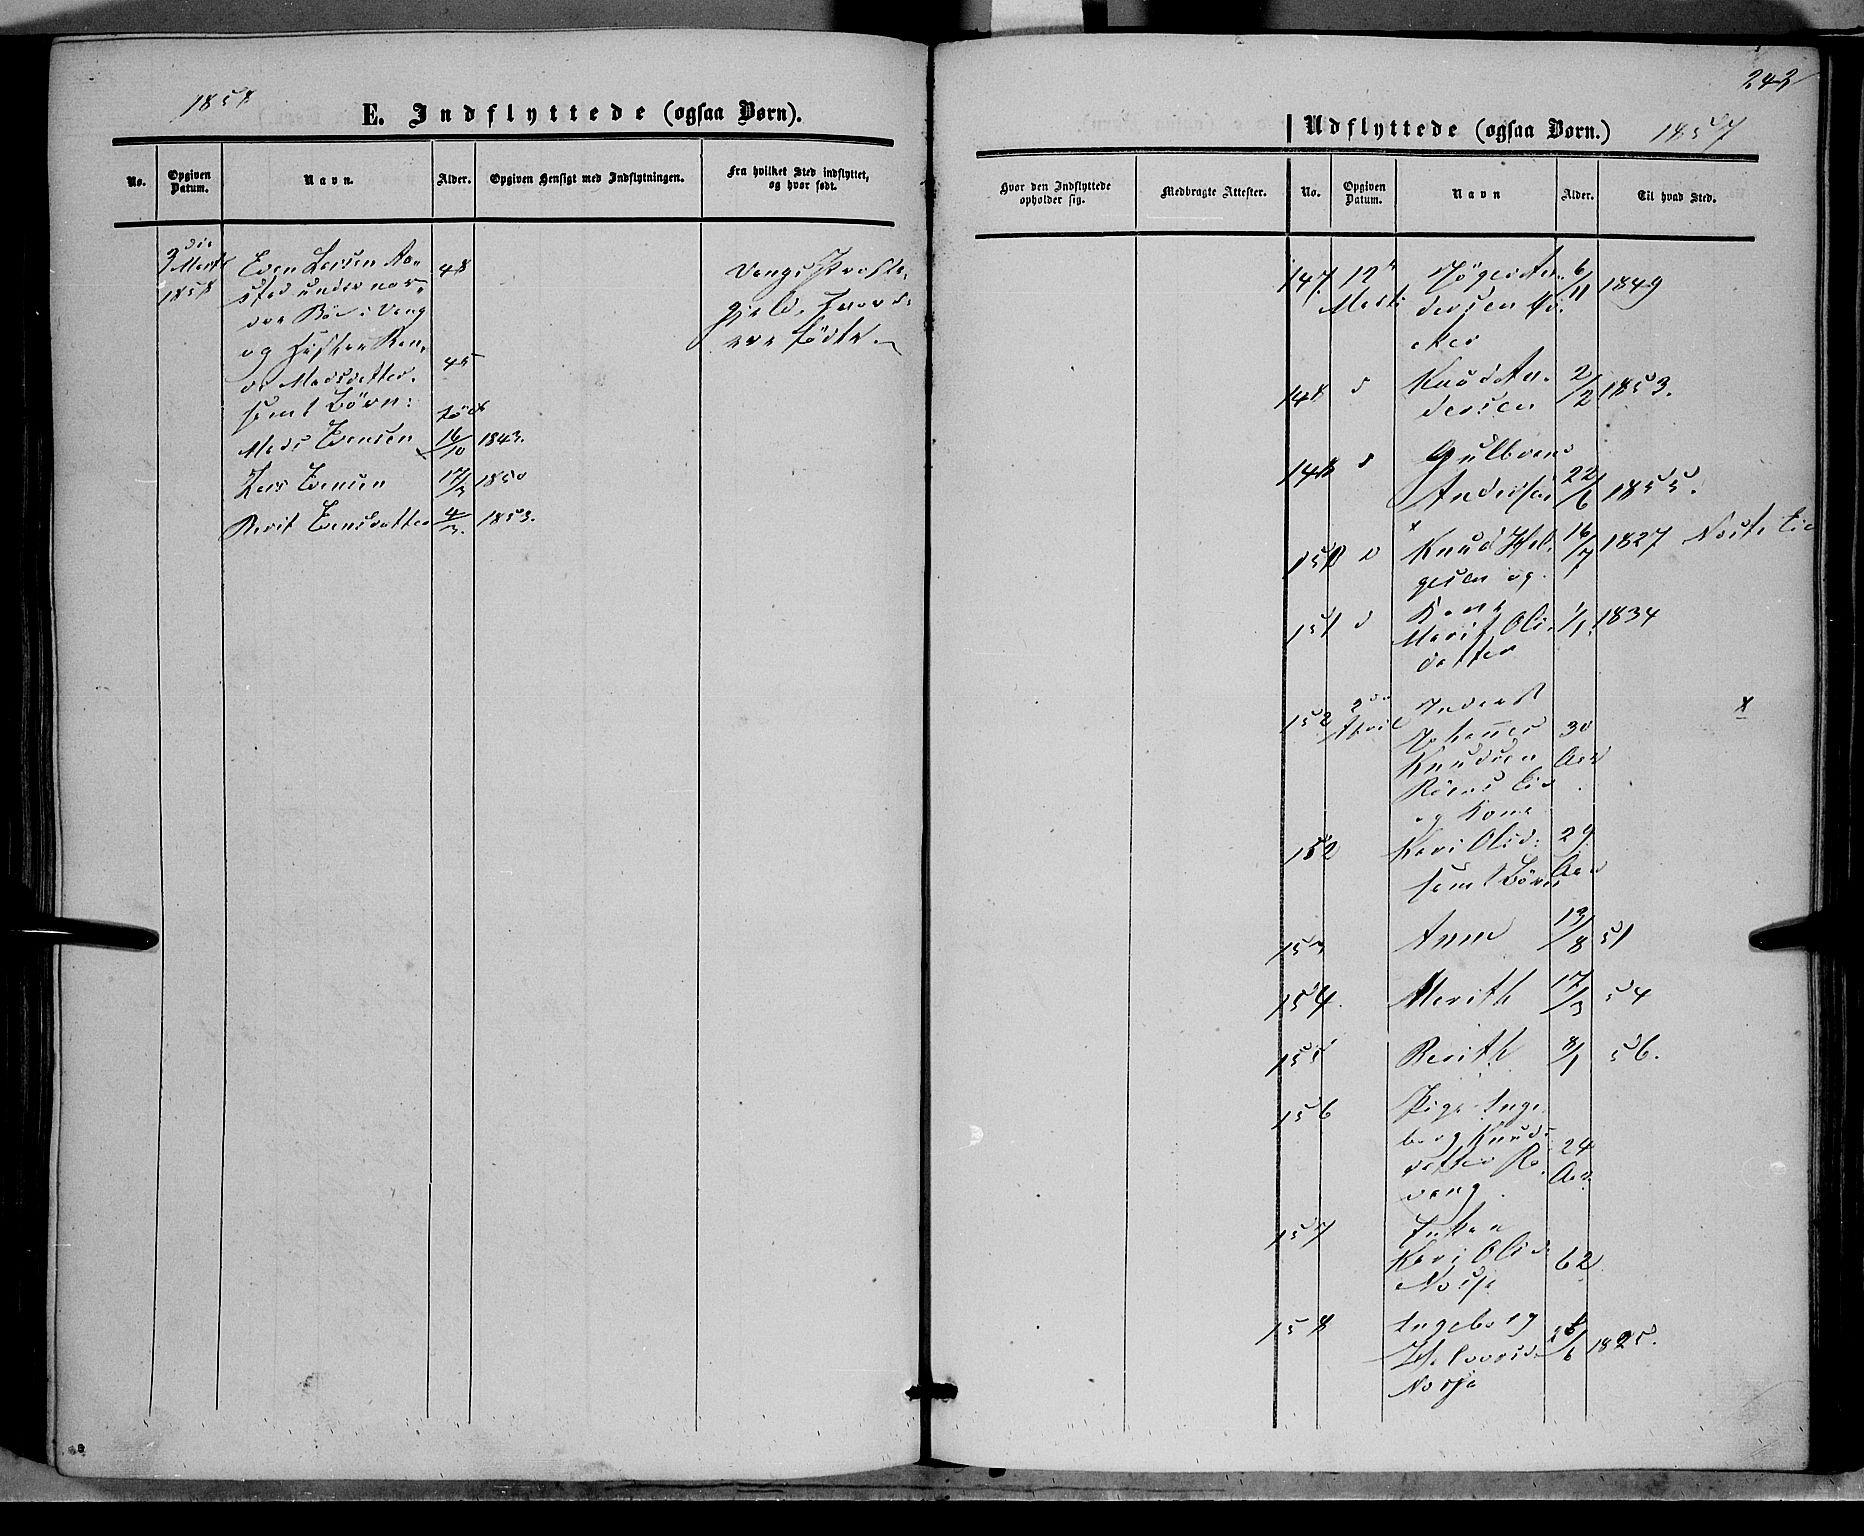 SAH, Vestre Slidre prestekontor, Ministerialbok nr. 2, 1856-1864, s. 242